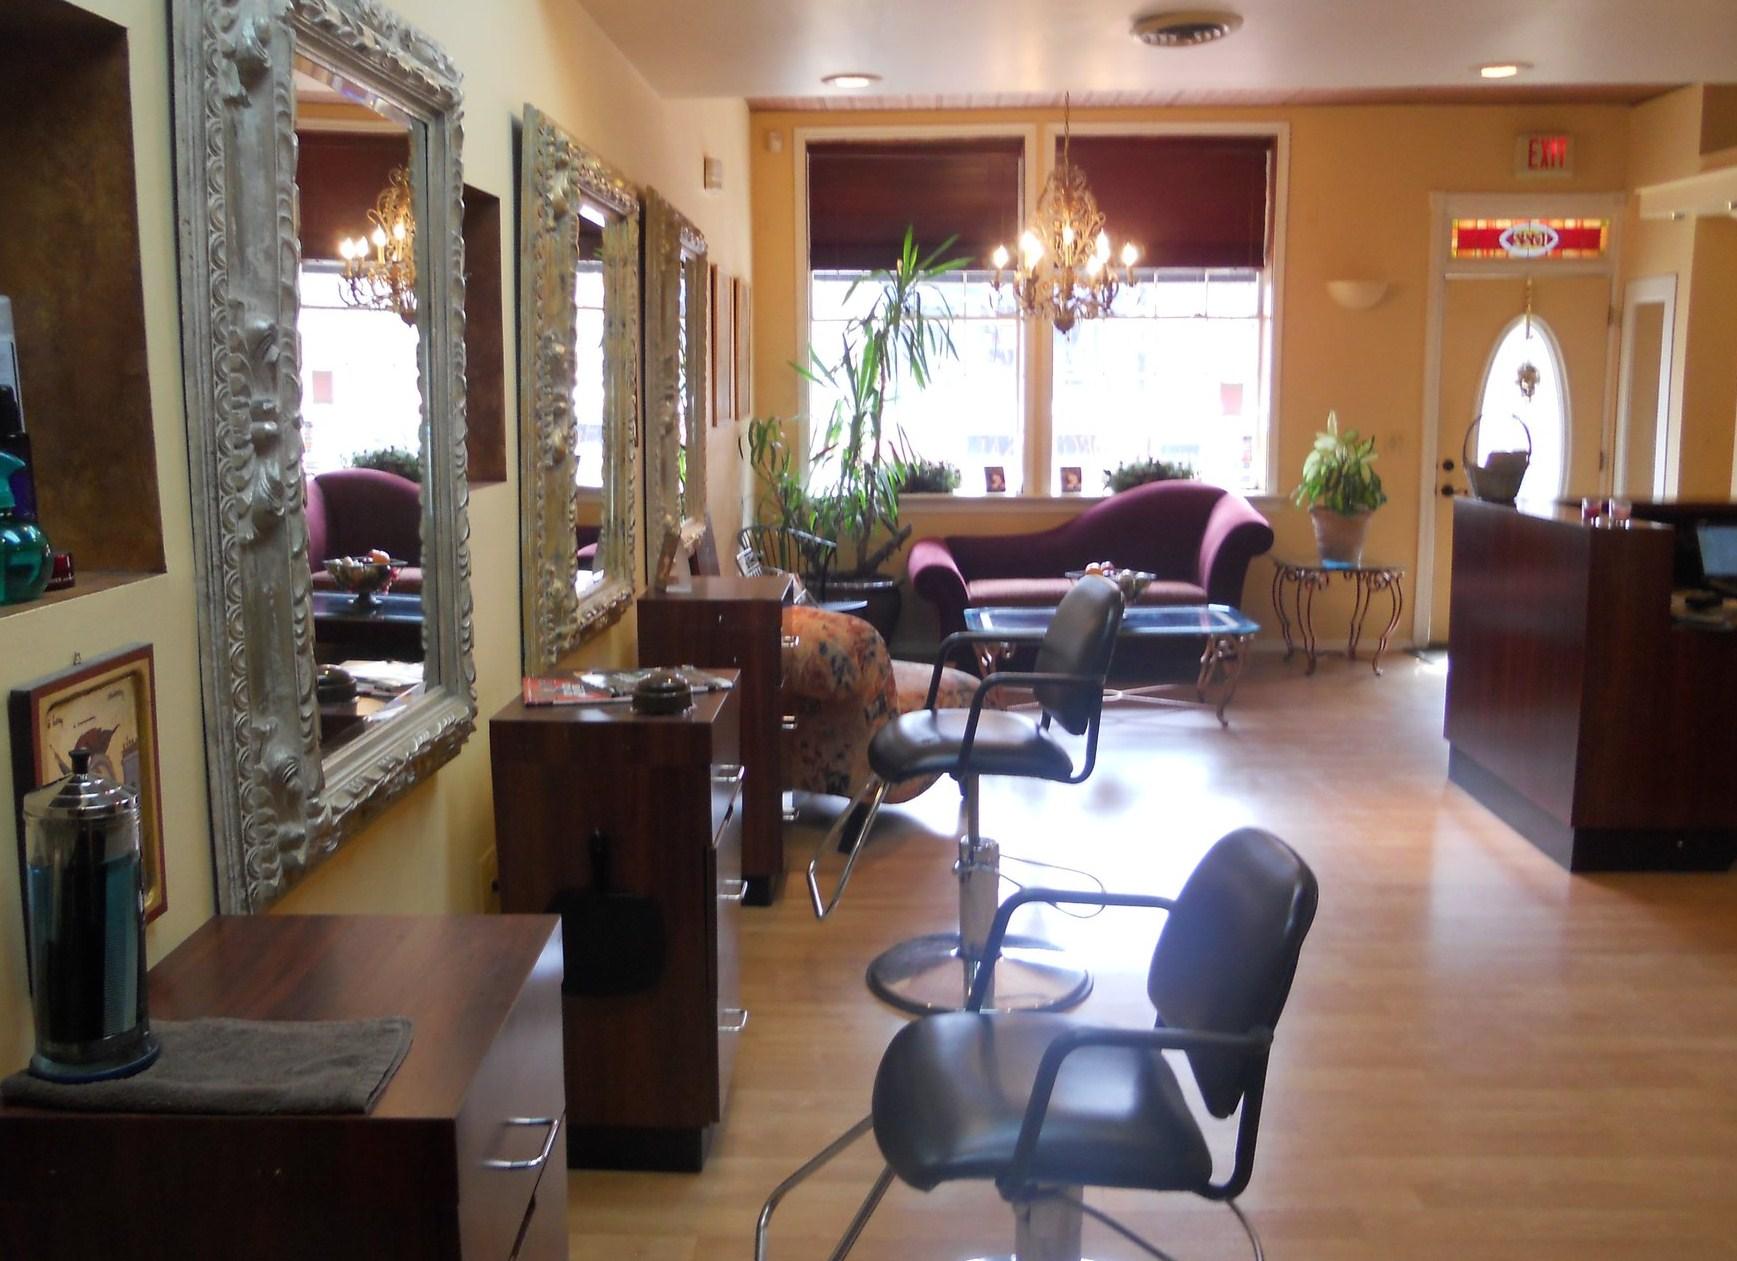 Zoom hair studio baltimore md groupon for 921 salon baltimore